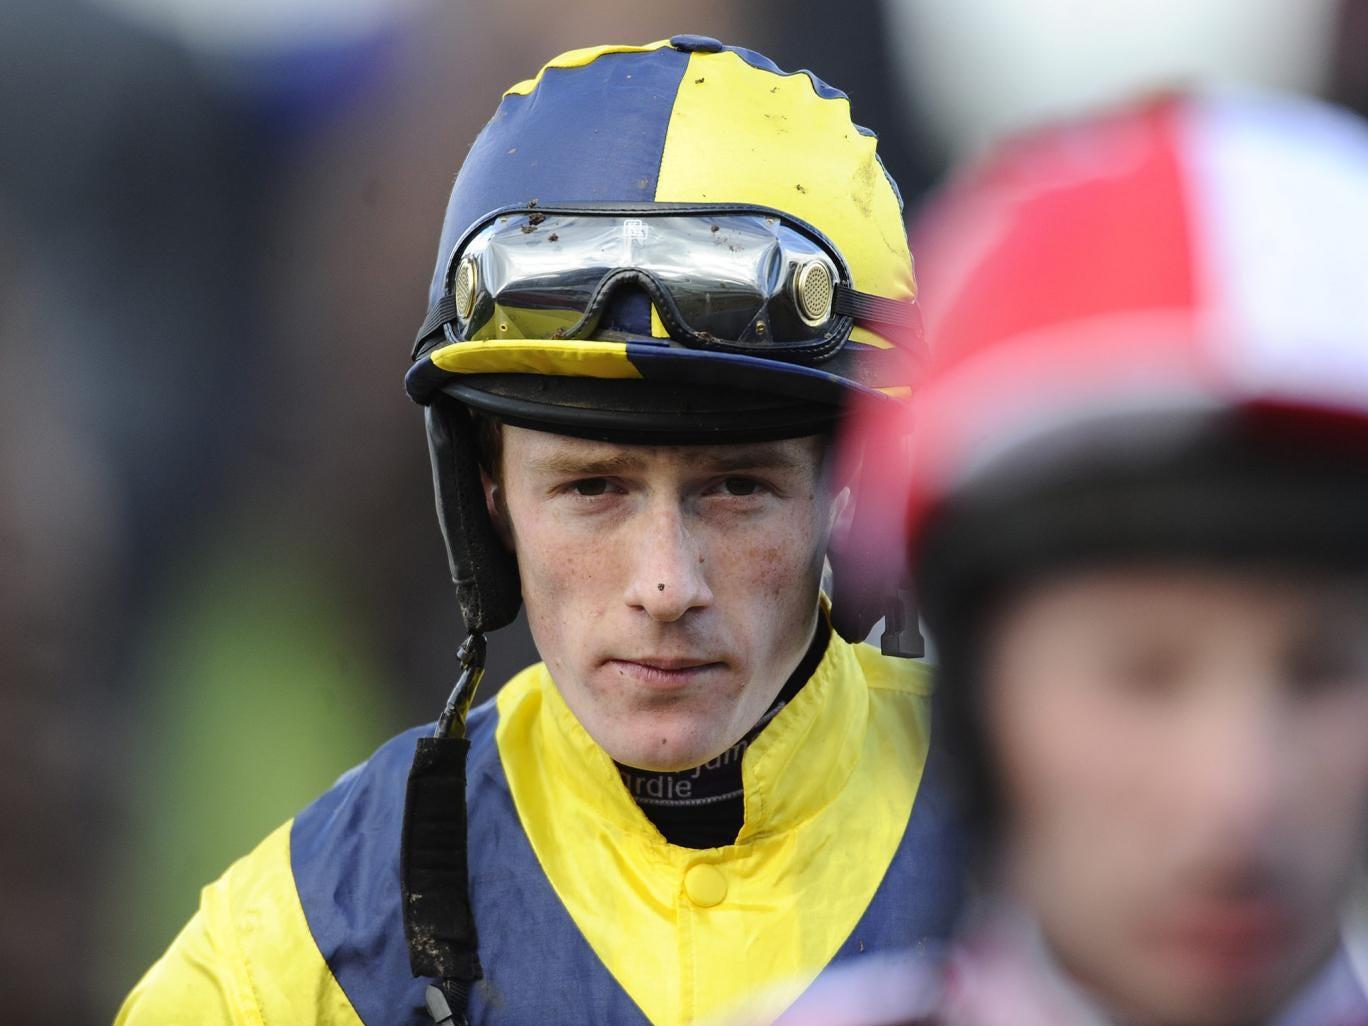 Sam Twiston-Davies will ride one of the favourites - Tidal Bay